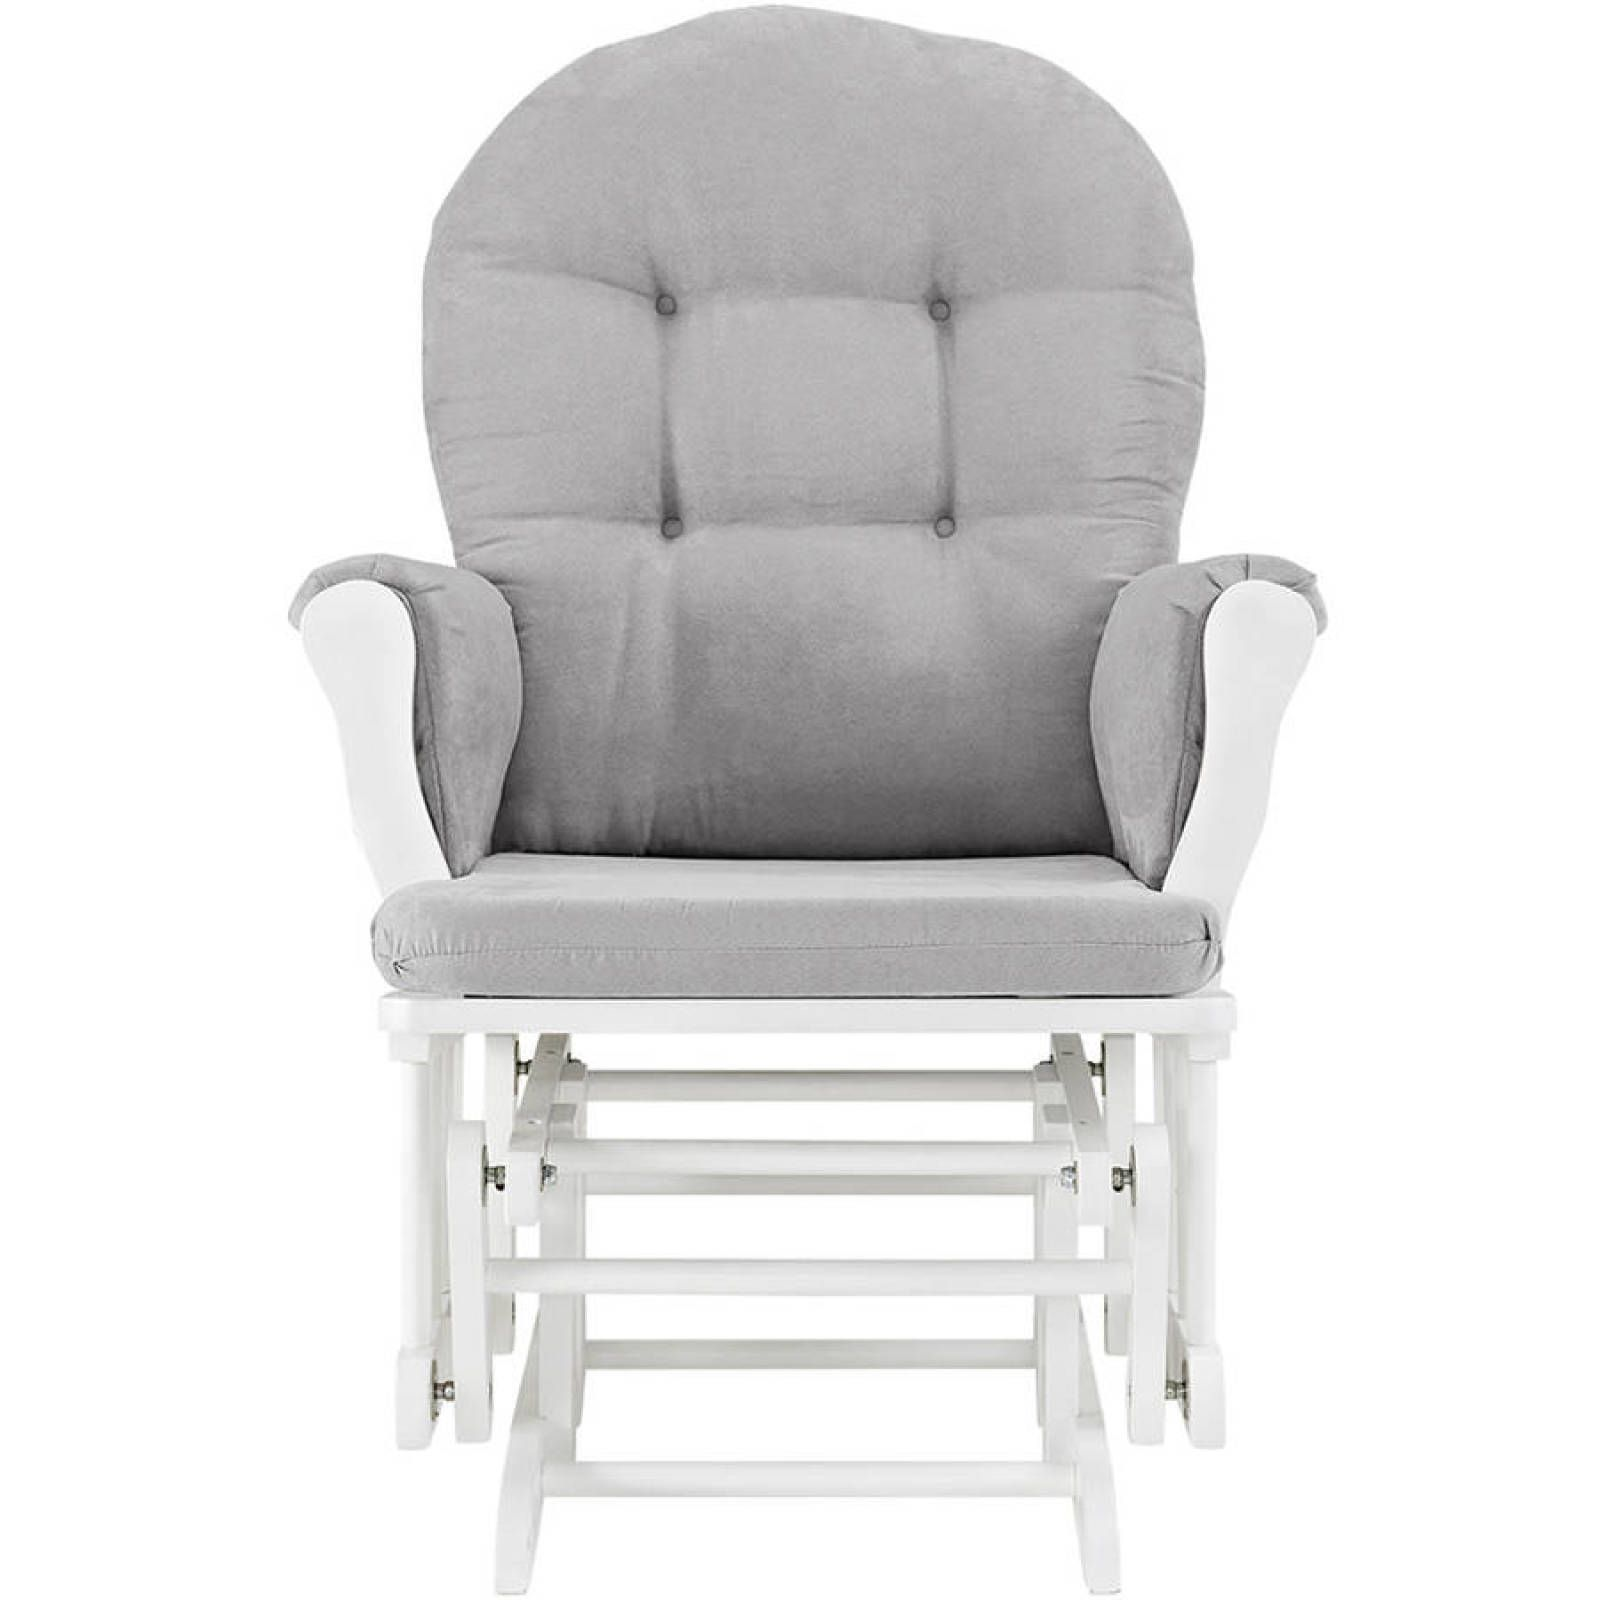 Glider and ottoman set white finish gray cushions nursery